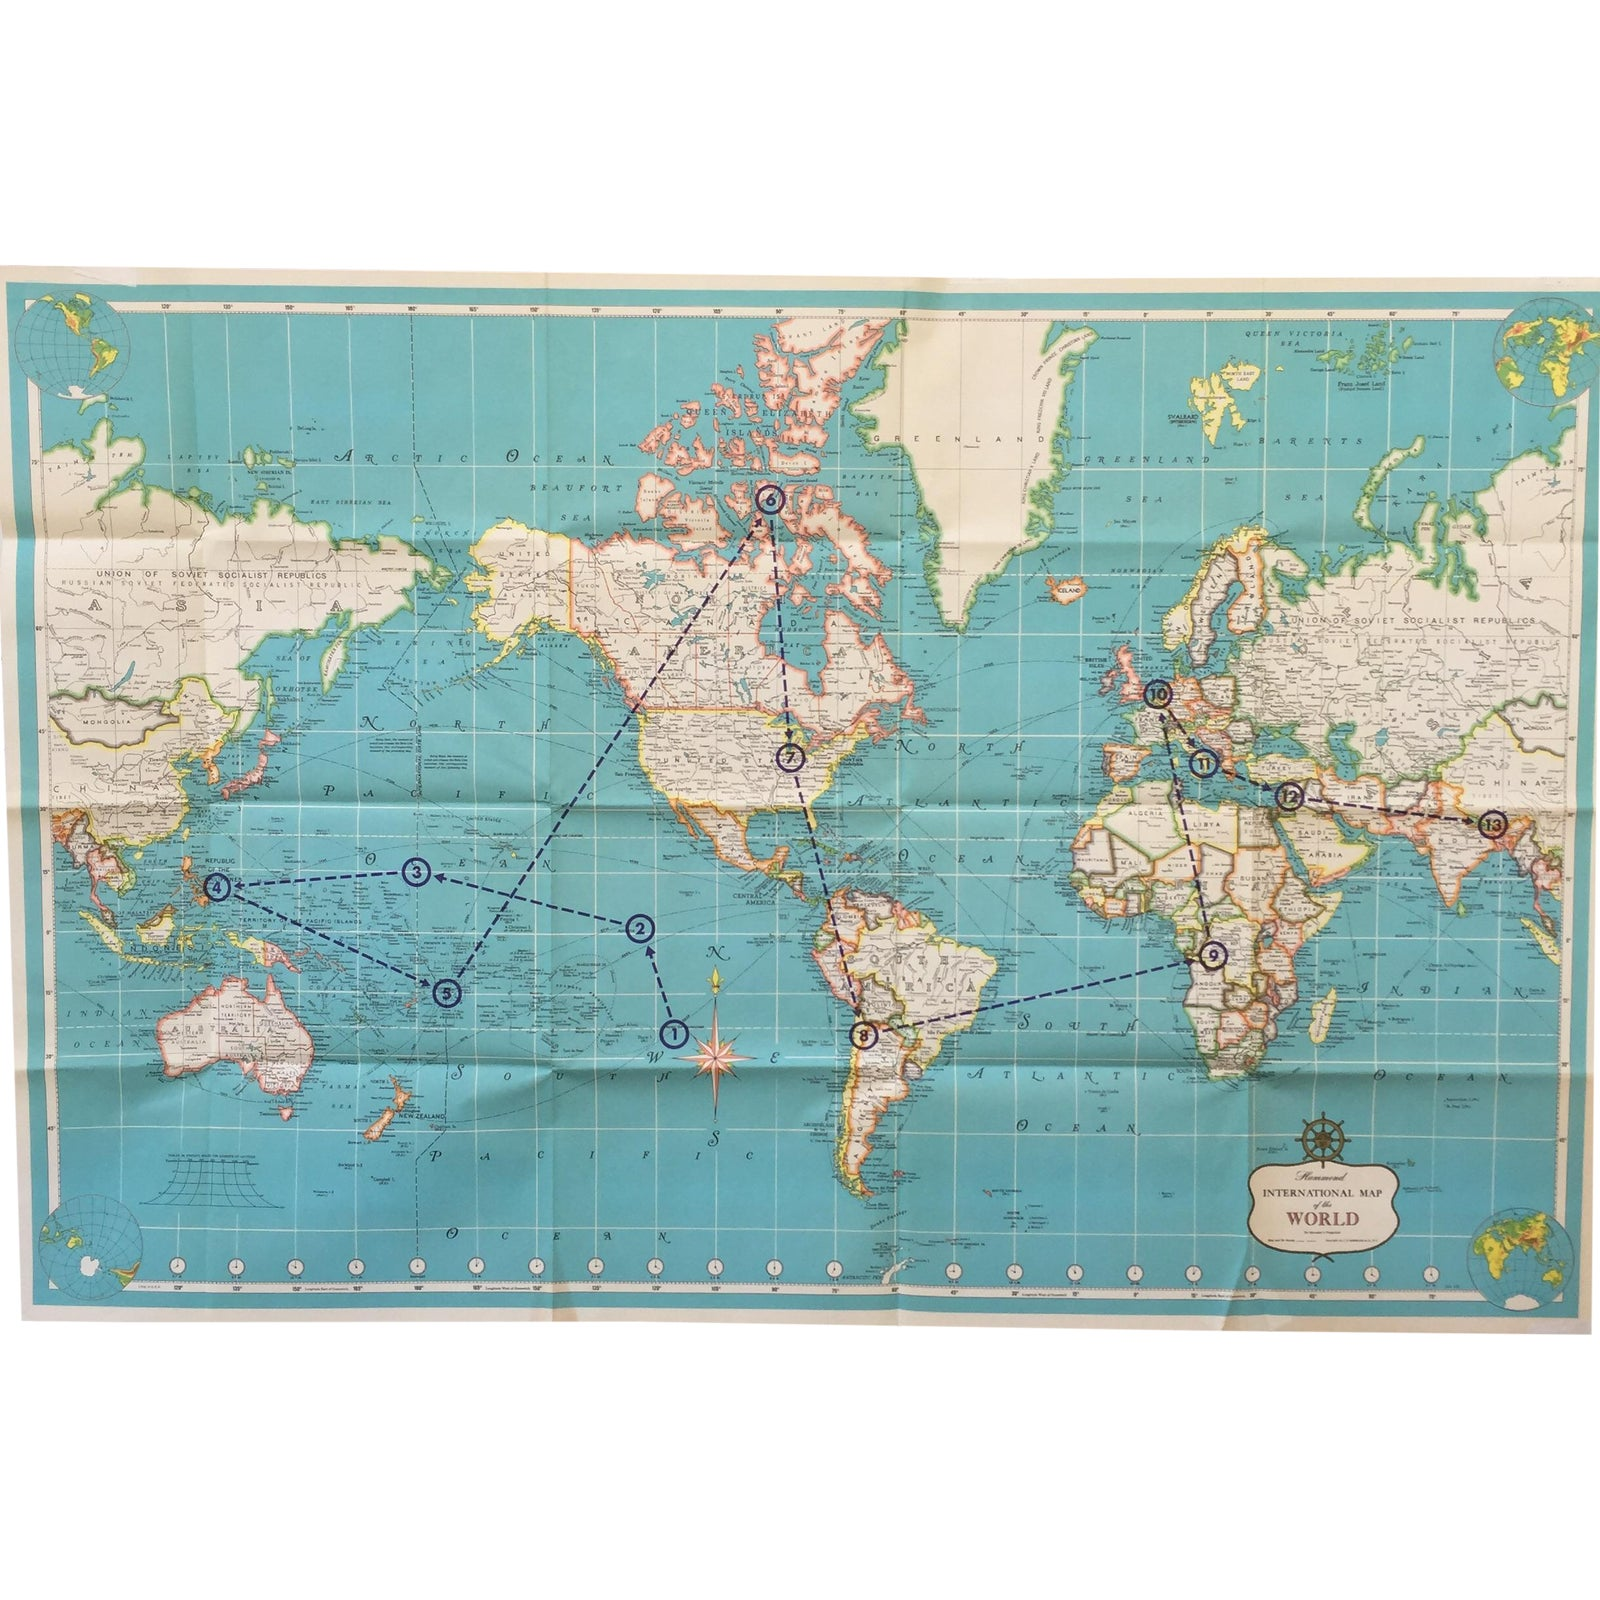 Vintage International Map of the World by Hammond | Chairish